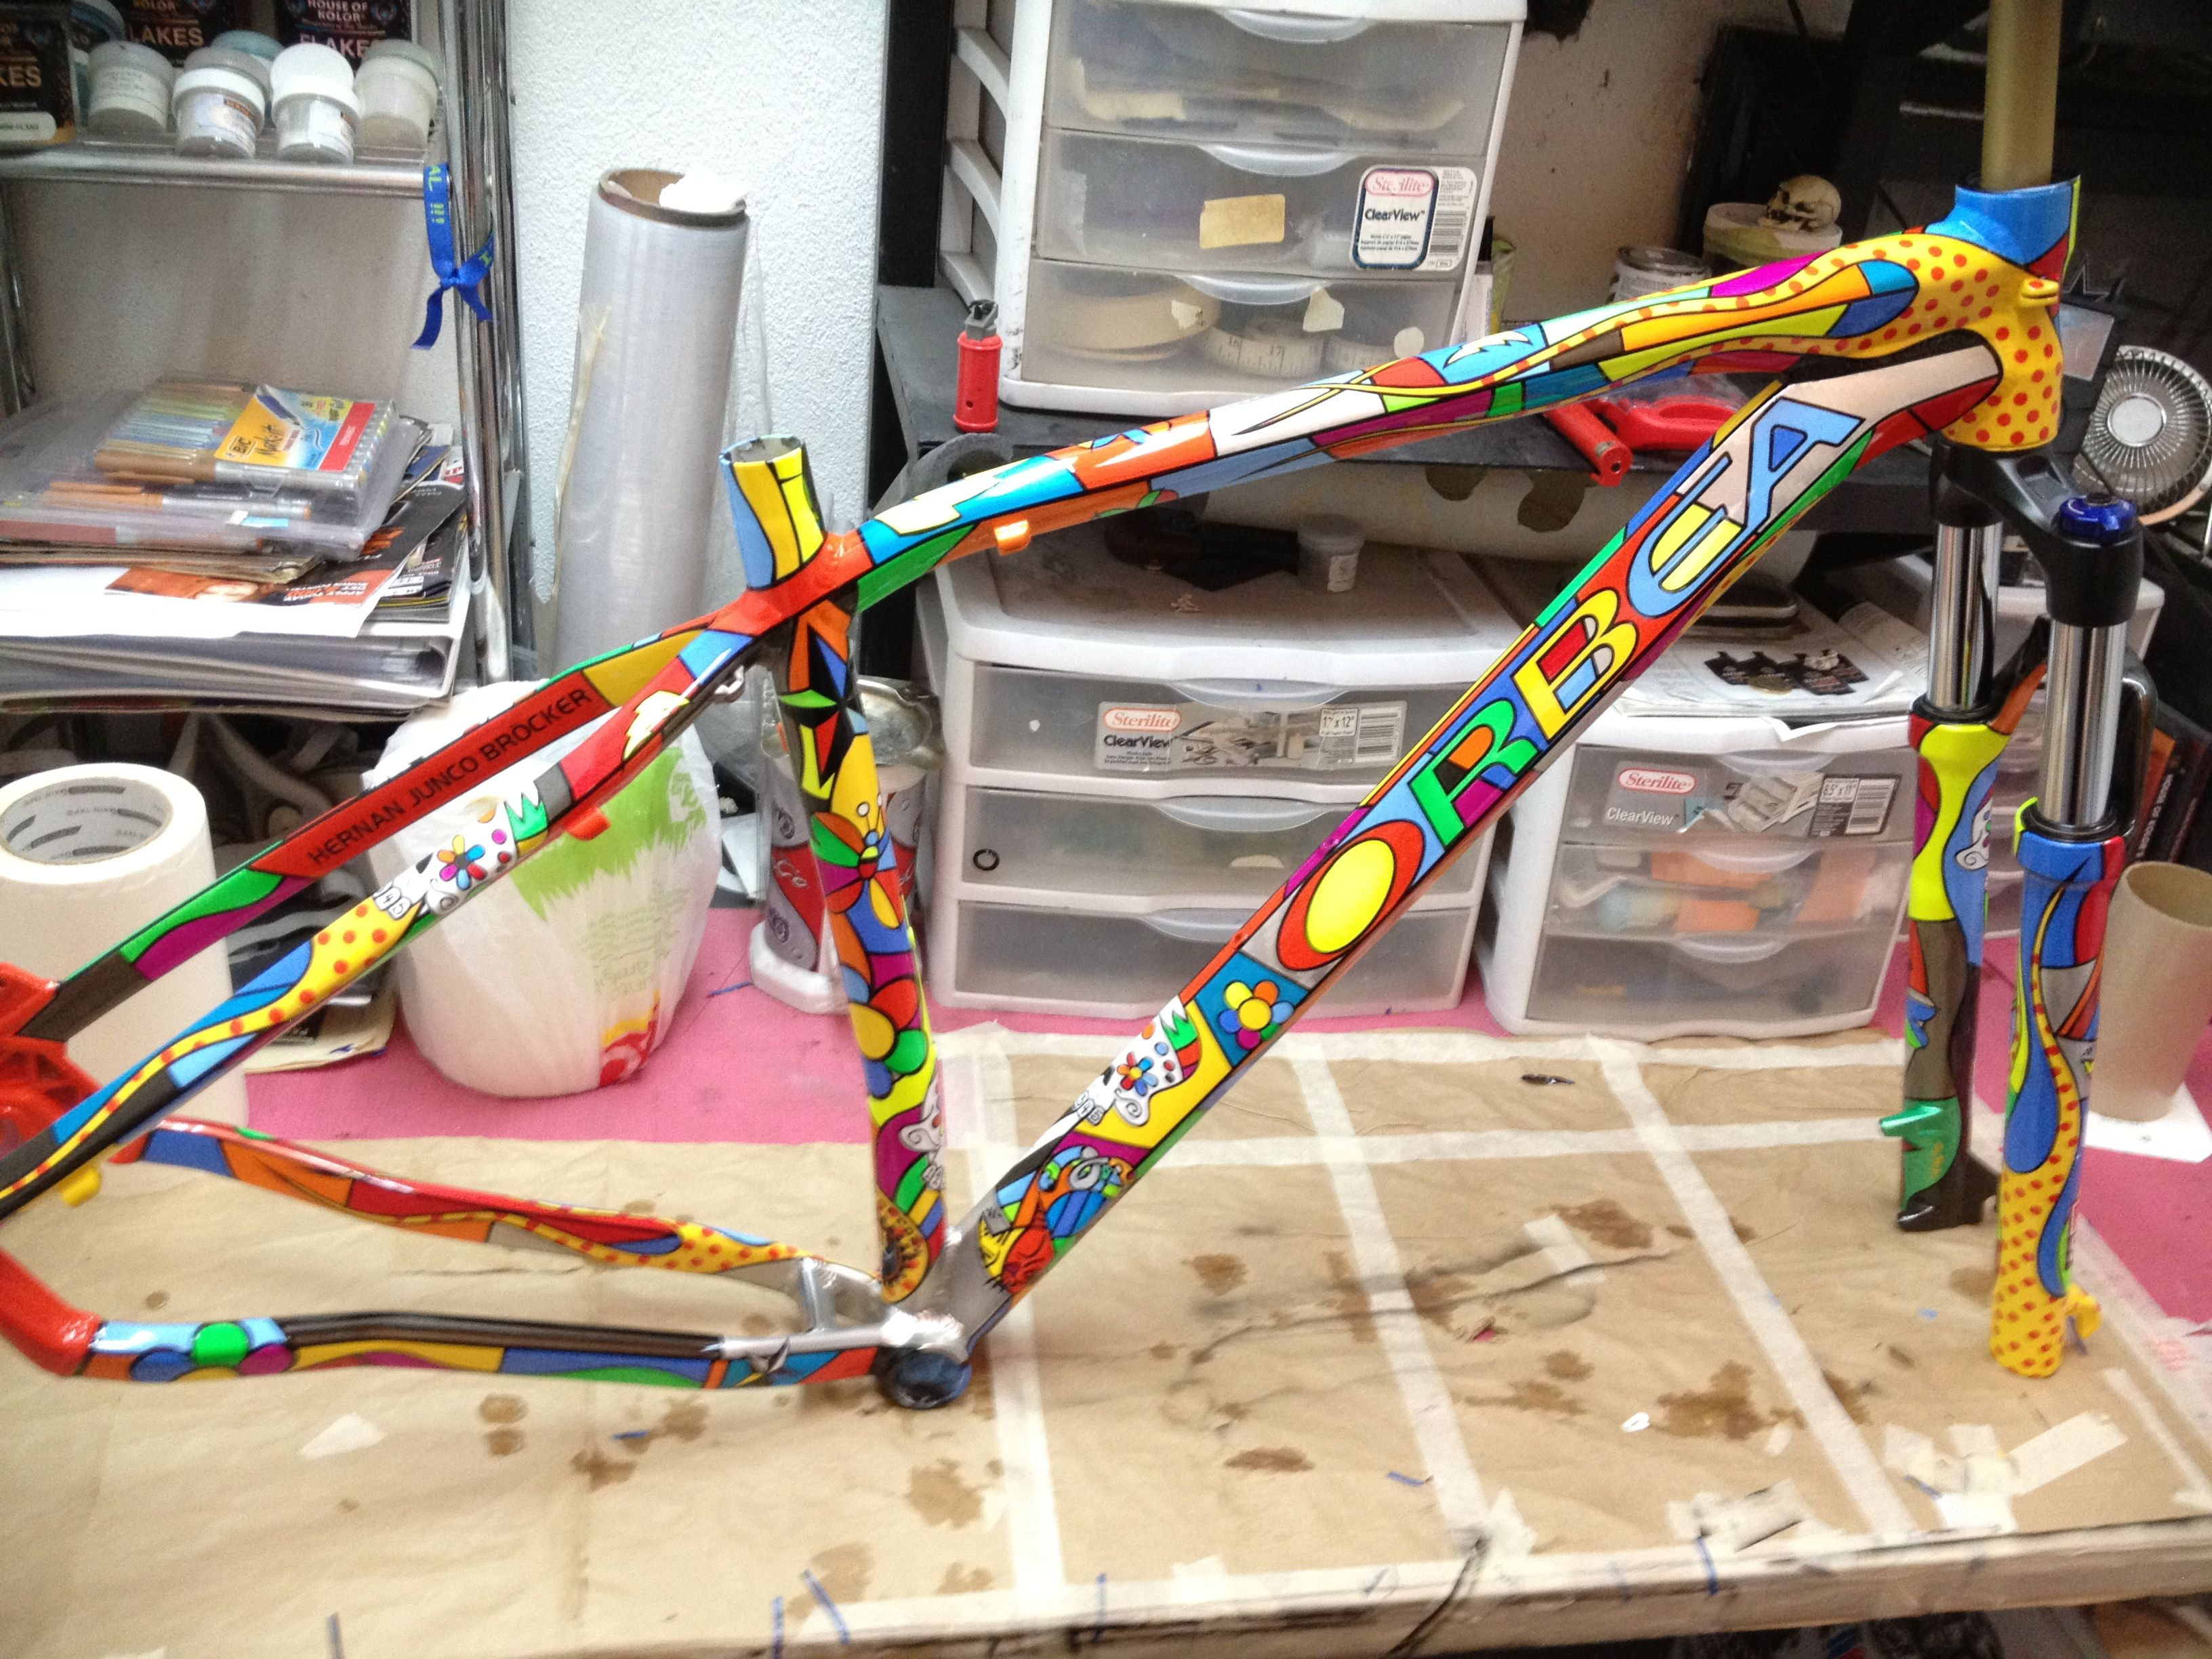 Custom paint job on an Orbea mountain bike | Cycling | Pinterest ...